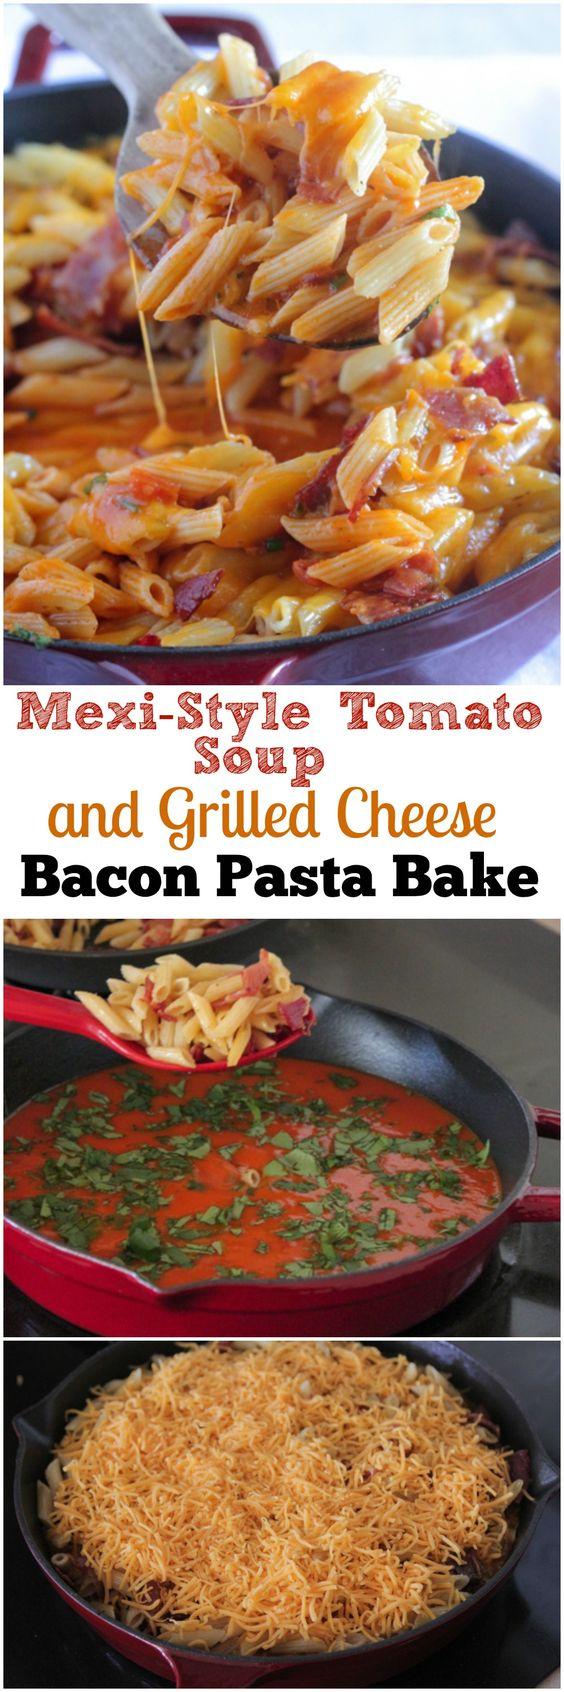 Pasta bake recipe tomato soup